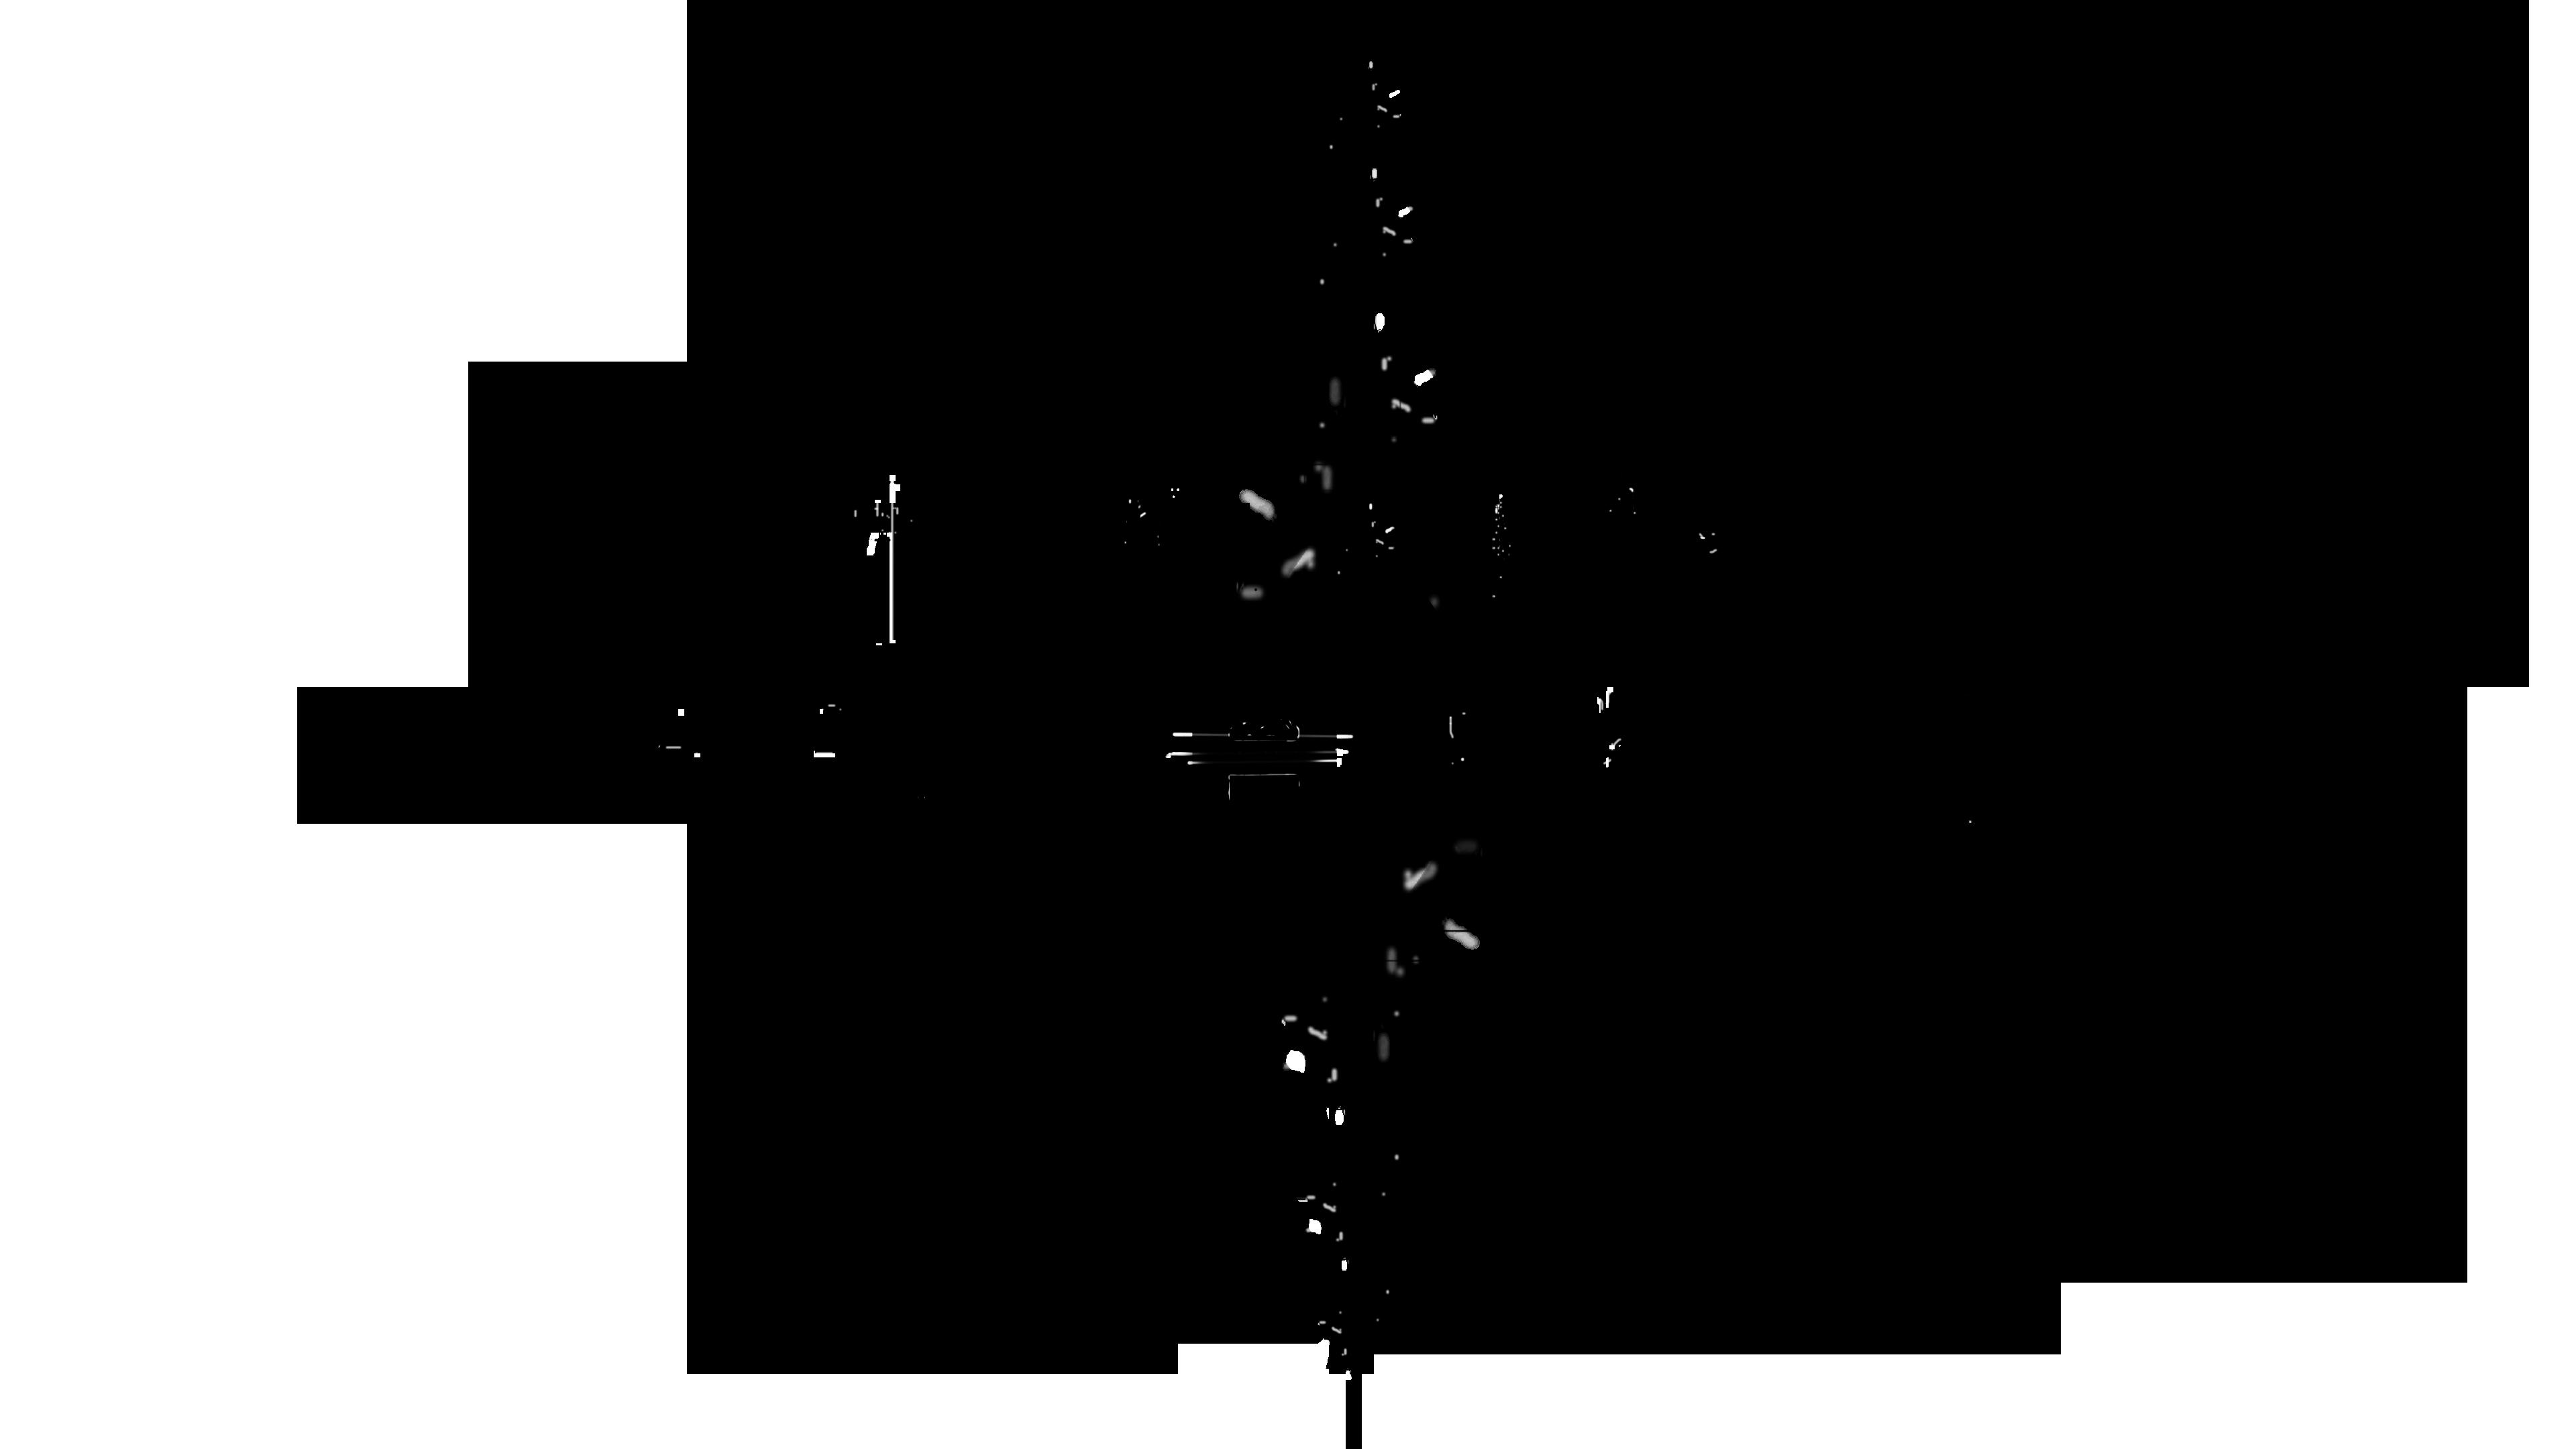 logo-titans-fall-harder